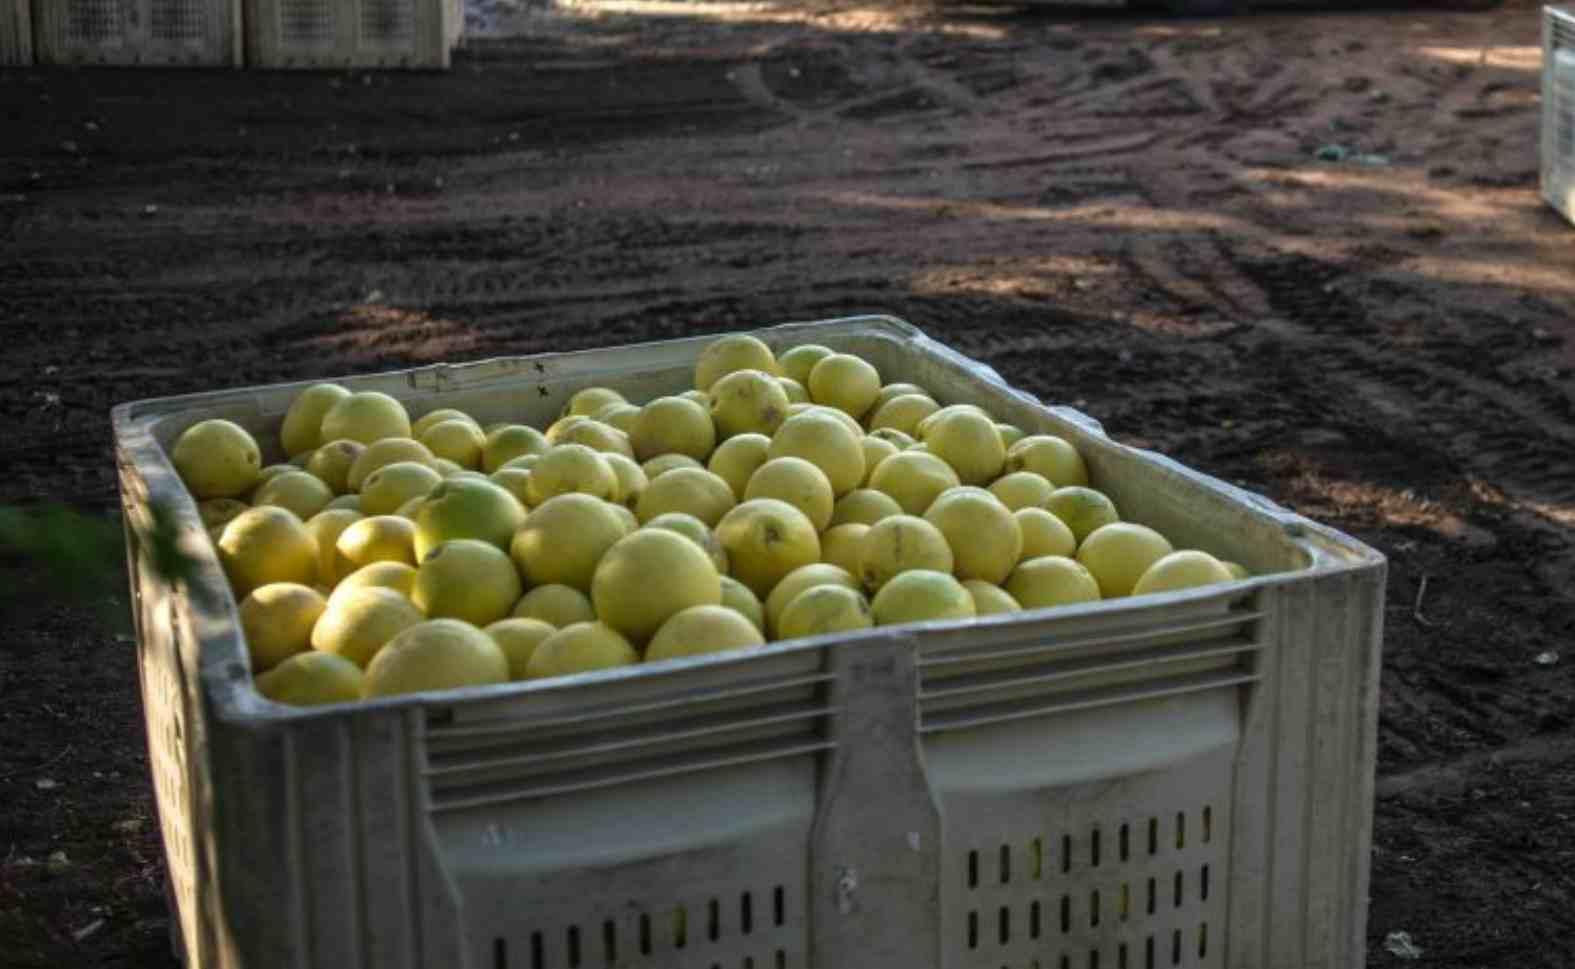 Siracusa limoni spagnoli cancerogeni sequestrati